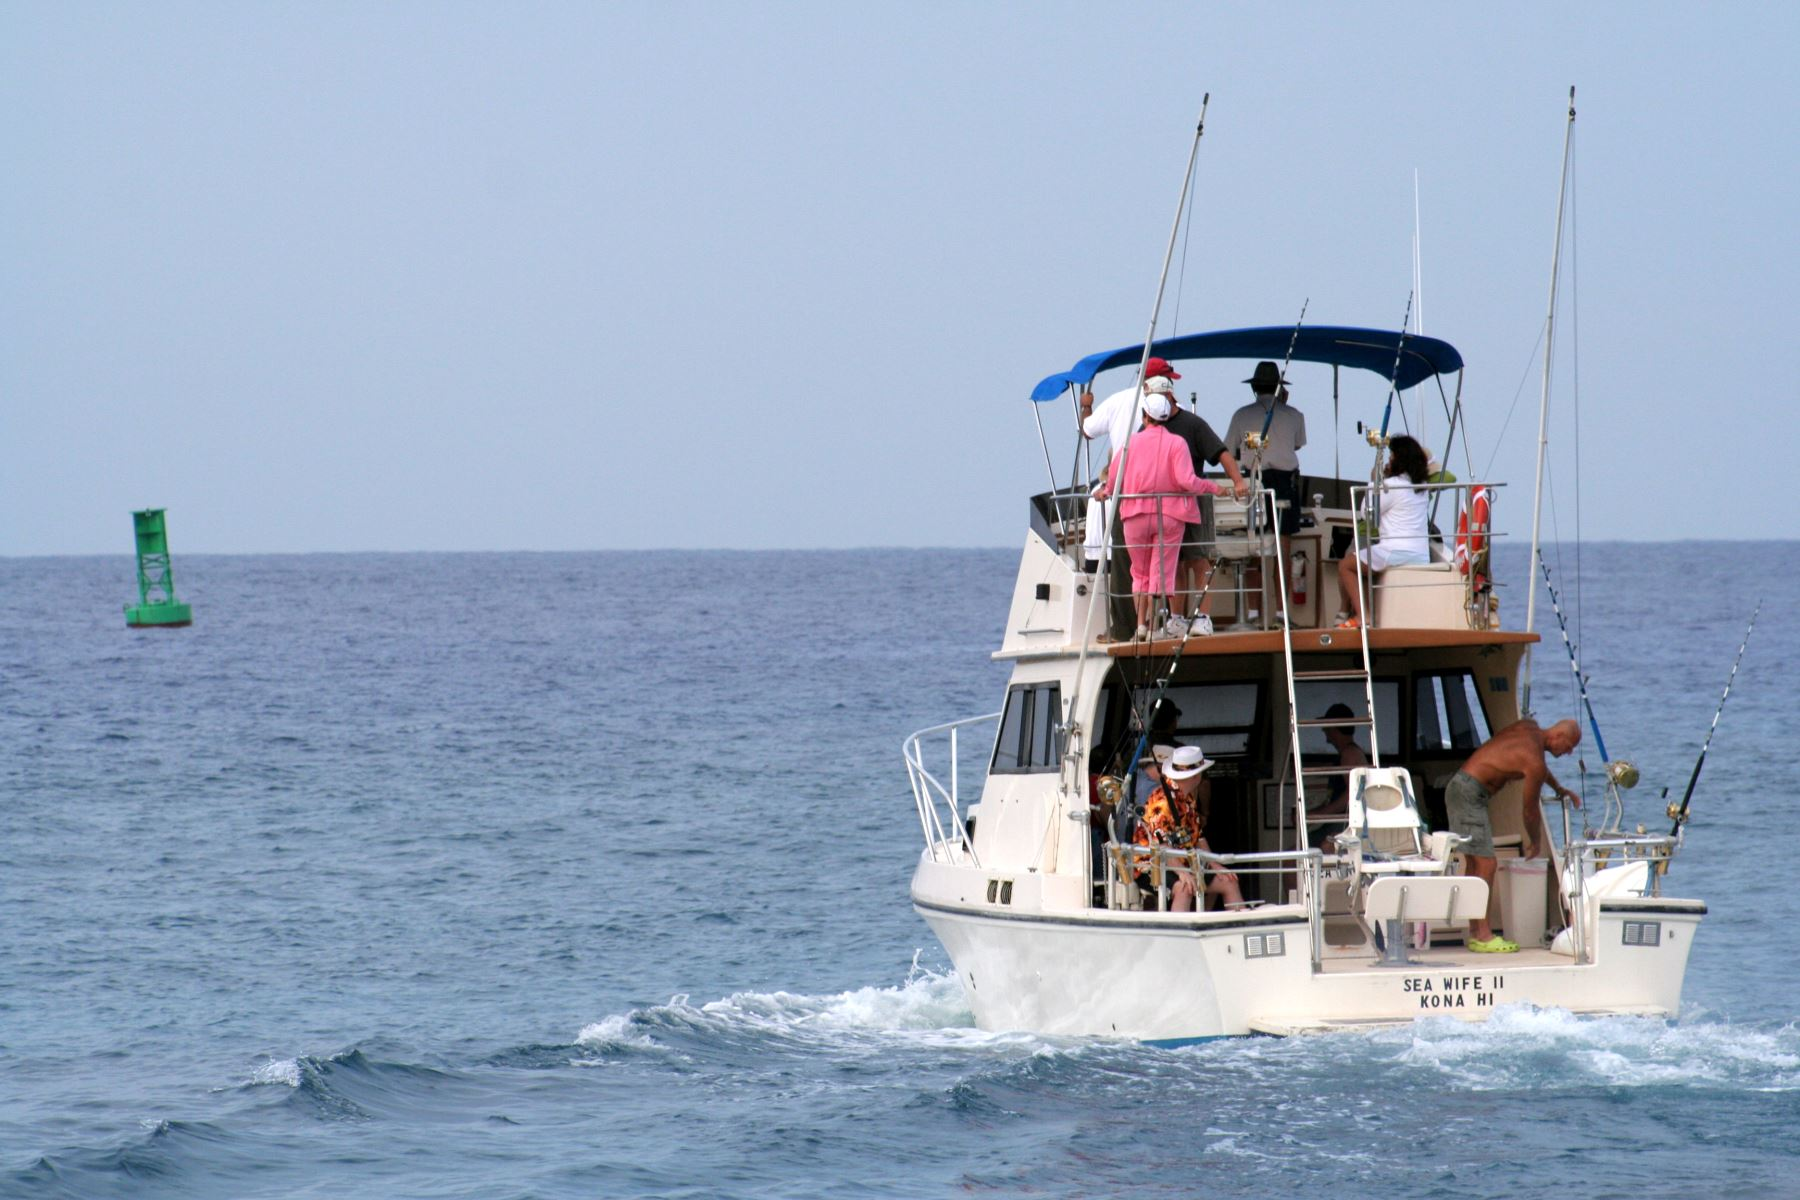 Hawaii charter fishing boat